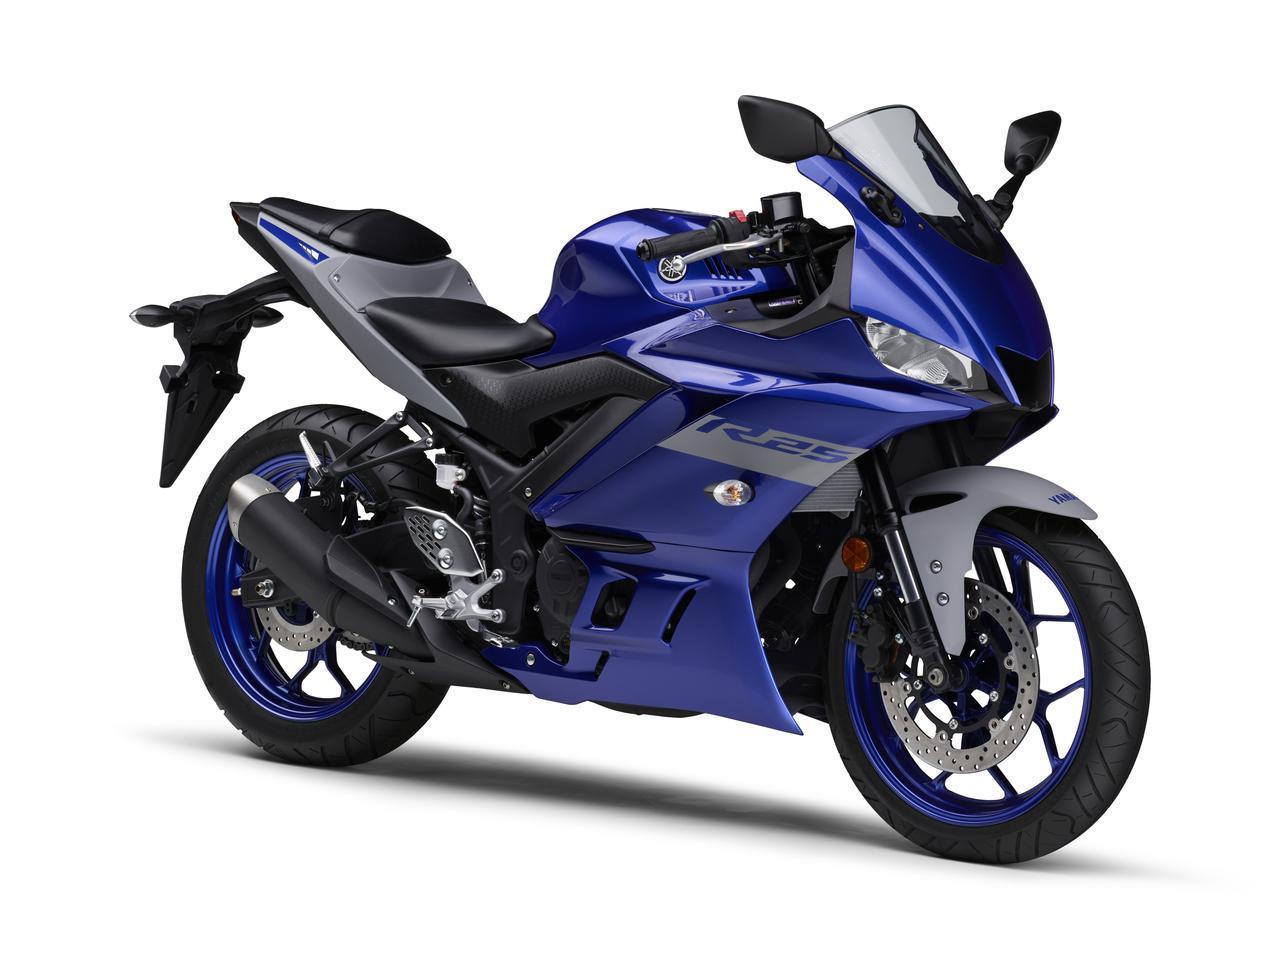 Images : 1番目の画像 - ヤマハ YZF-R25の写真をまとめて見る! - LAWRENCE - Motorcycle x Cars + α = Your Life.